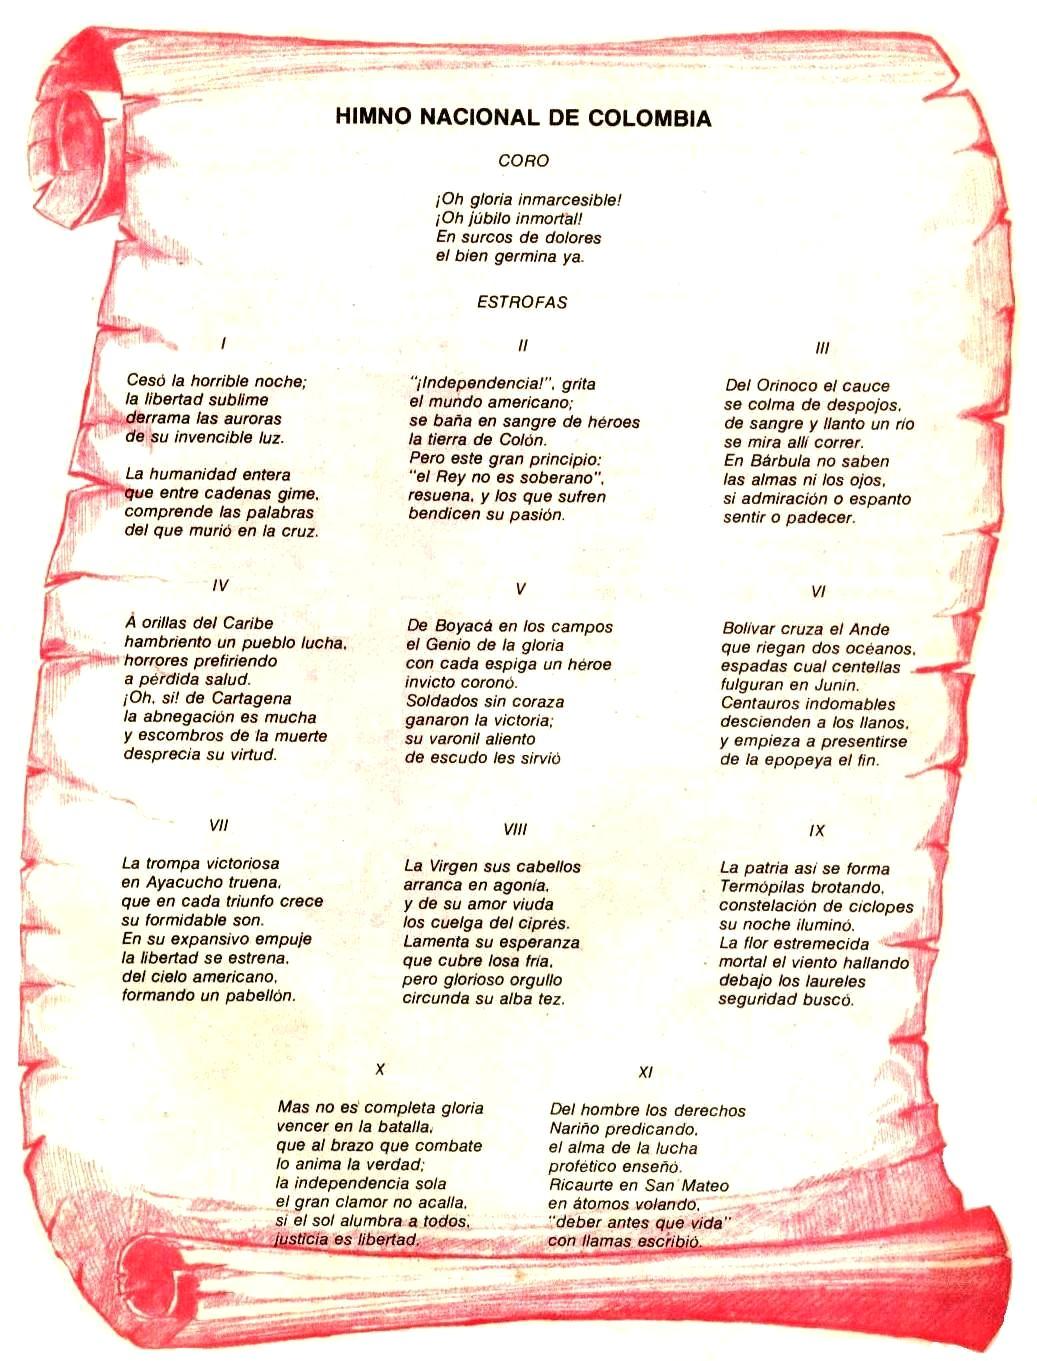 el himno nacional de la republica bolivariana de venezuela: